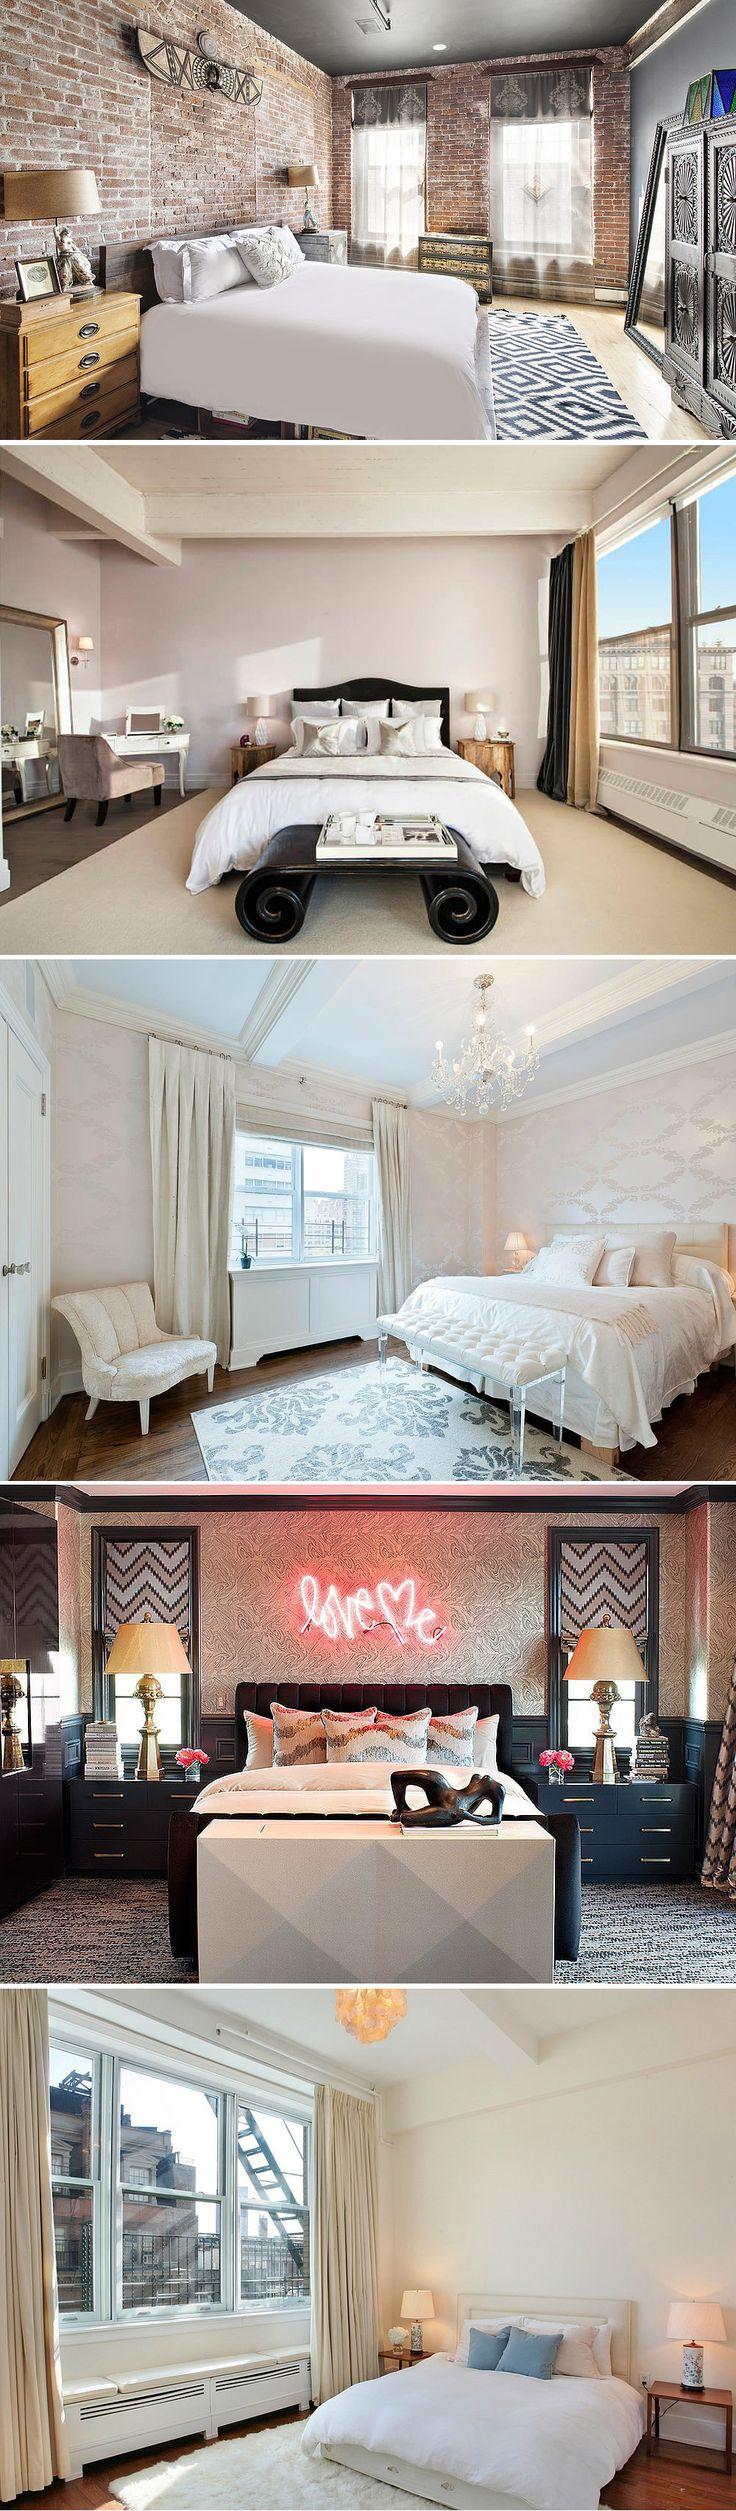 21 Celebrity Bedrooms We Want to Sleep In